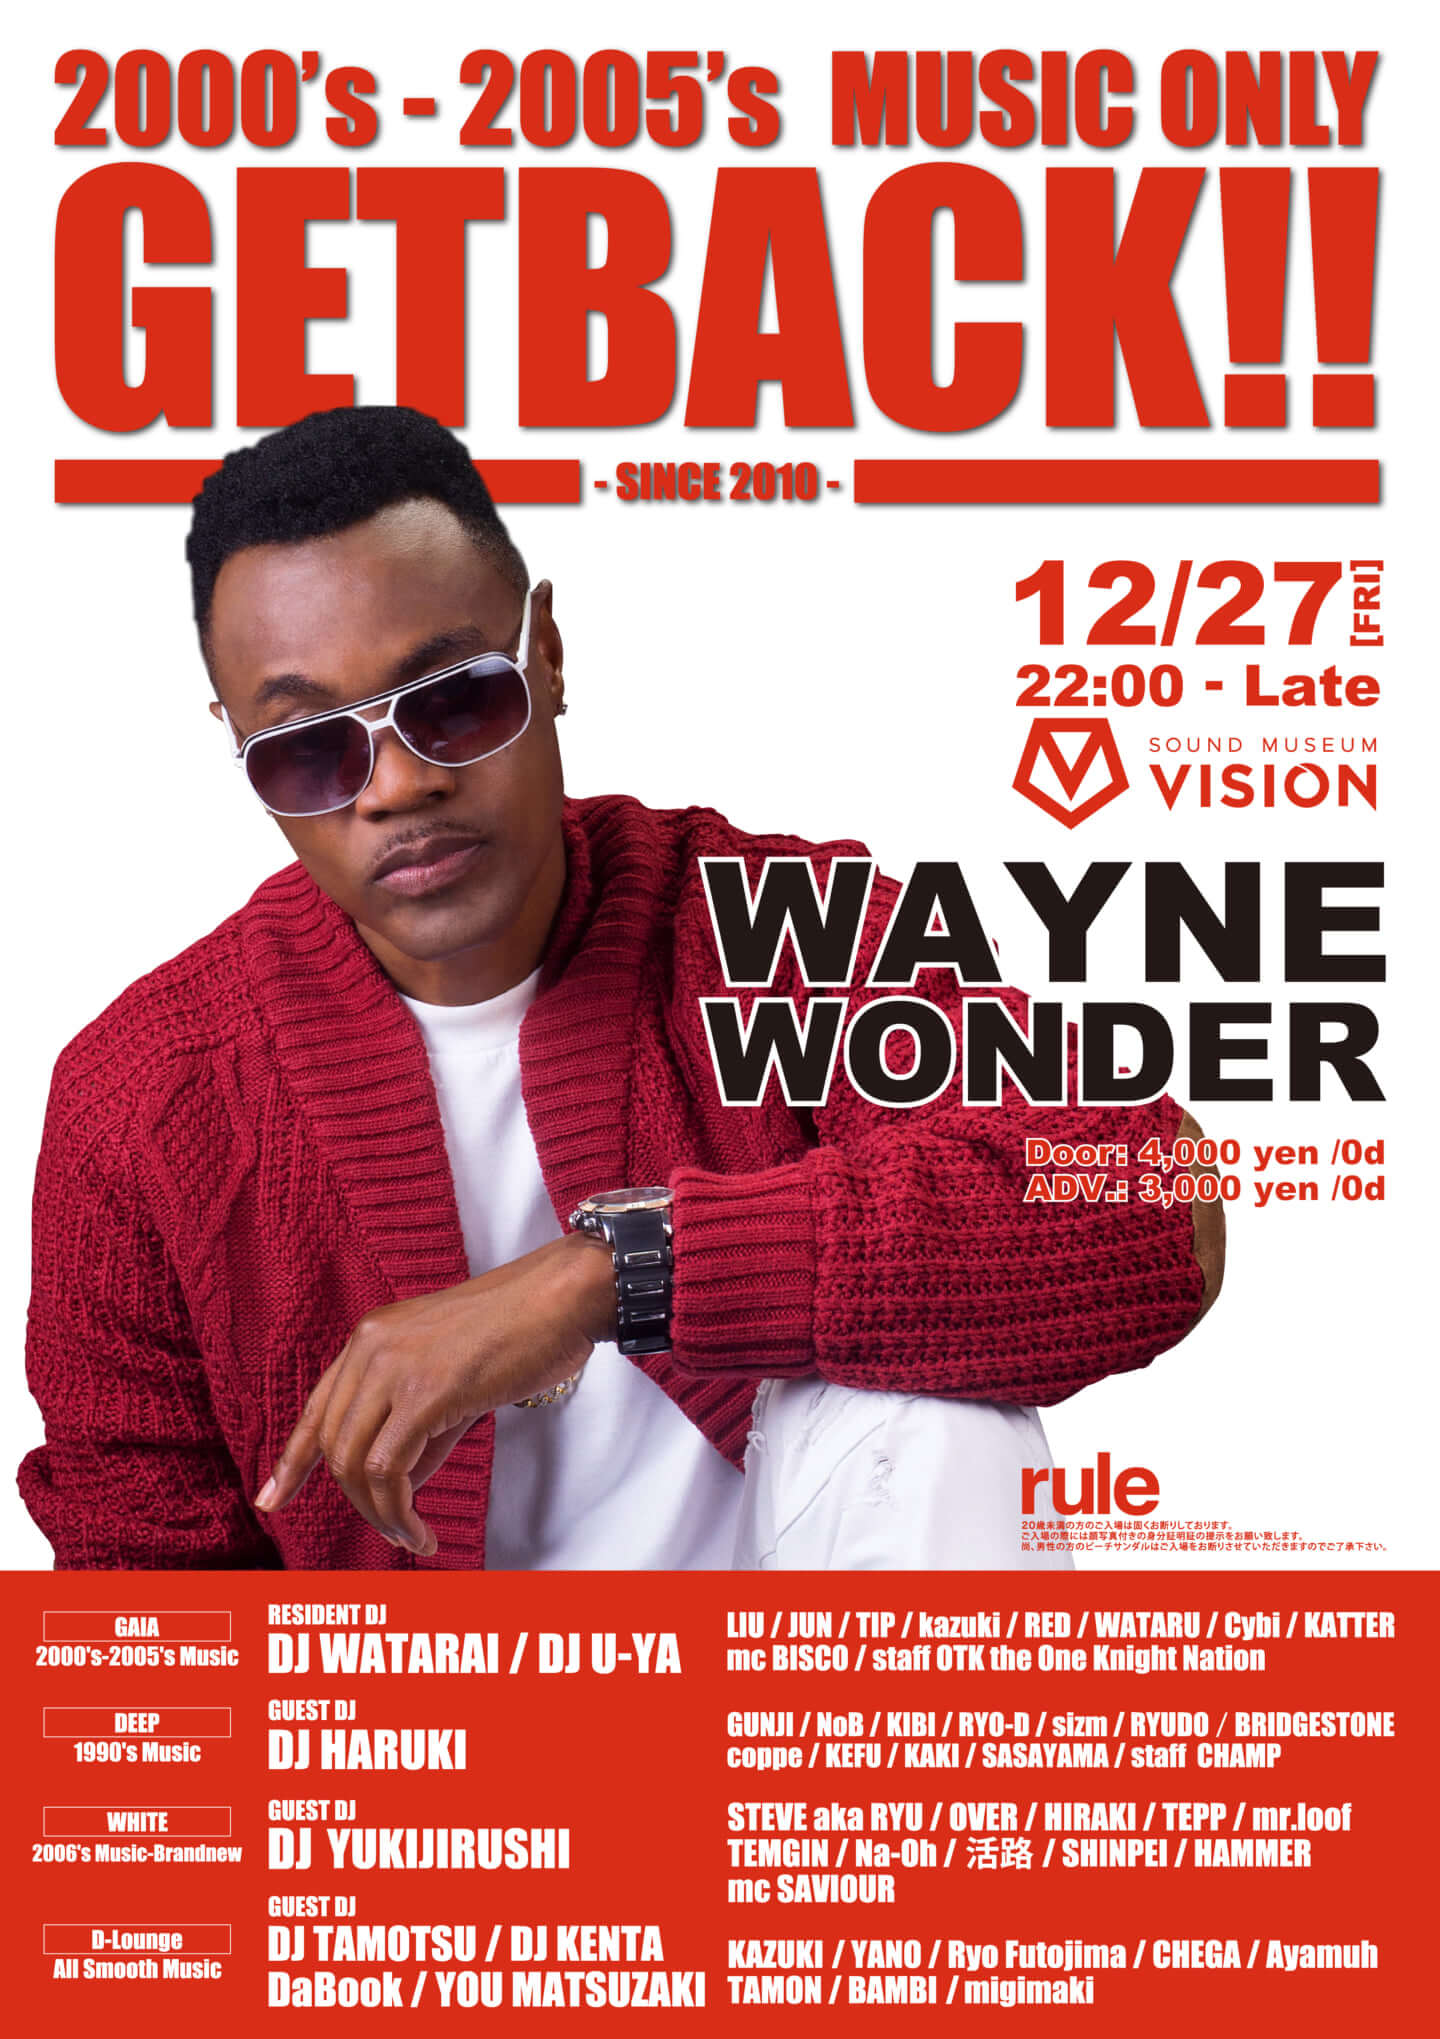 Wayne Wonderが登場!00年~05年に焦点をあてたThrowBackヒップ・ホップ・パーティー<GETBACK!!>が渋谷VISIONにて開催!その魅力に迫る! music191225_main-1440x2039